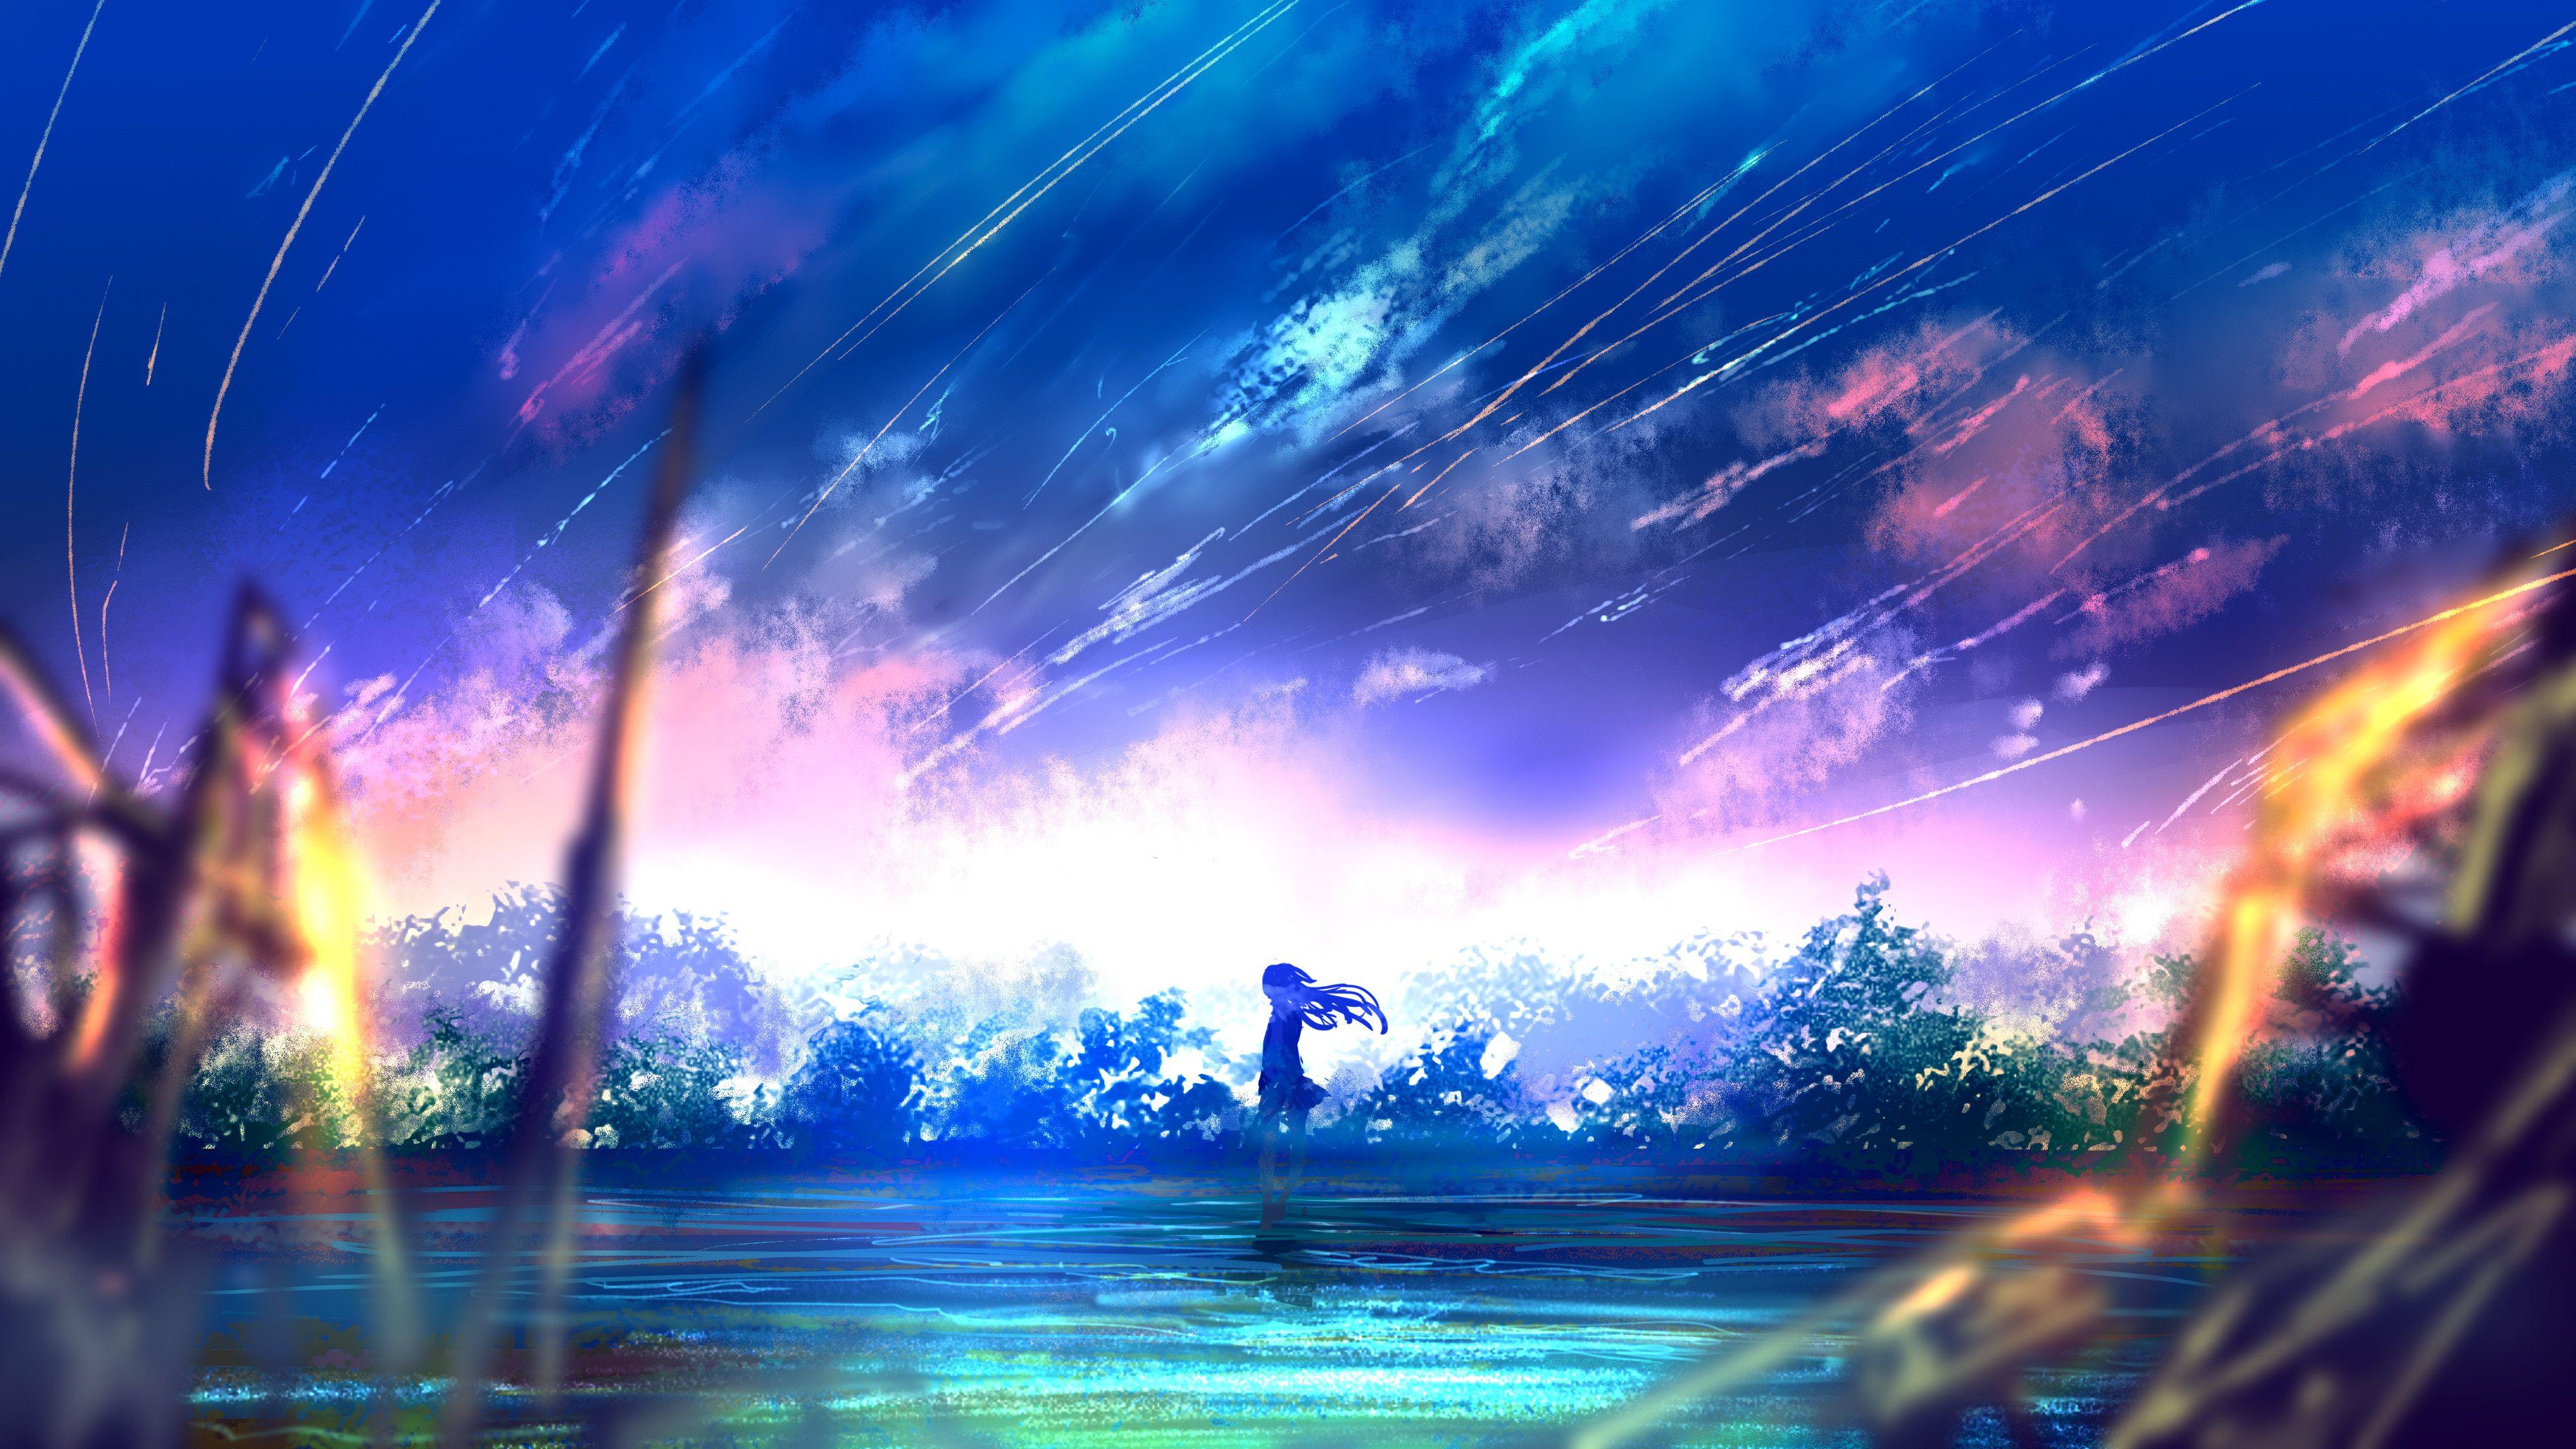 4k Wallpaper Anime Landscape Hd Art Wallpaper Scenery Wallpaper Landscape Wallpaper Anime Scenery